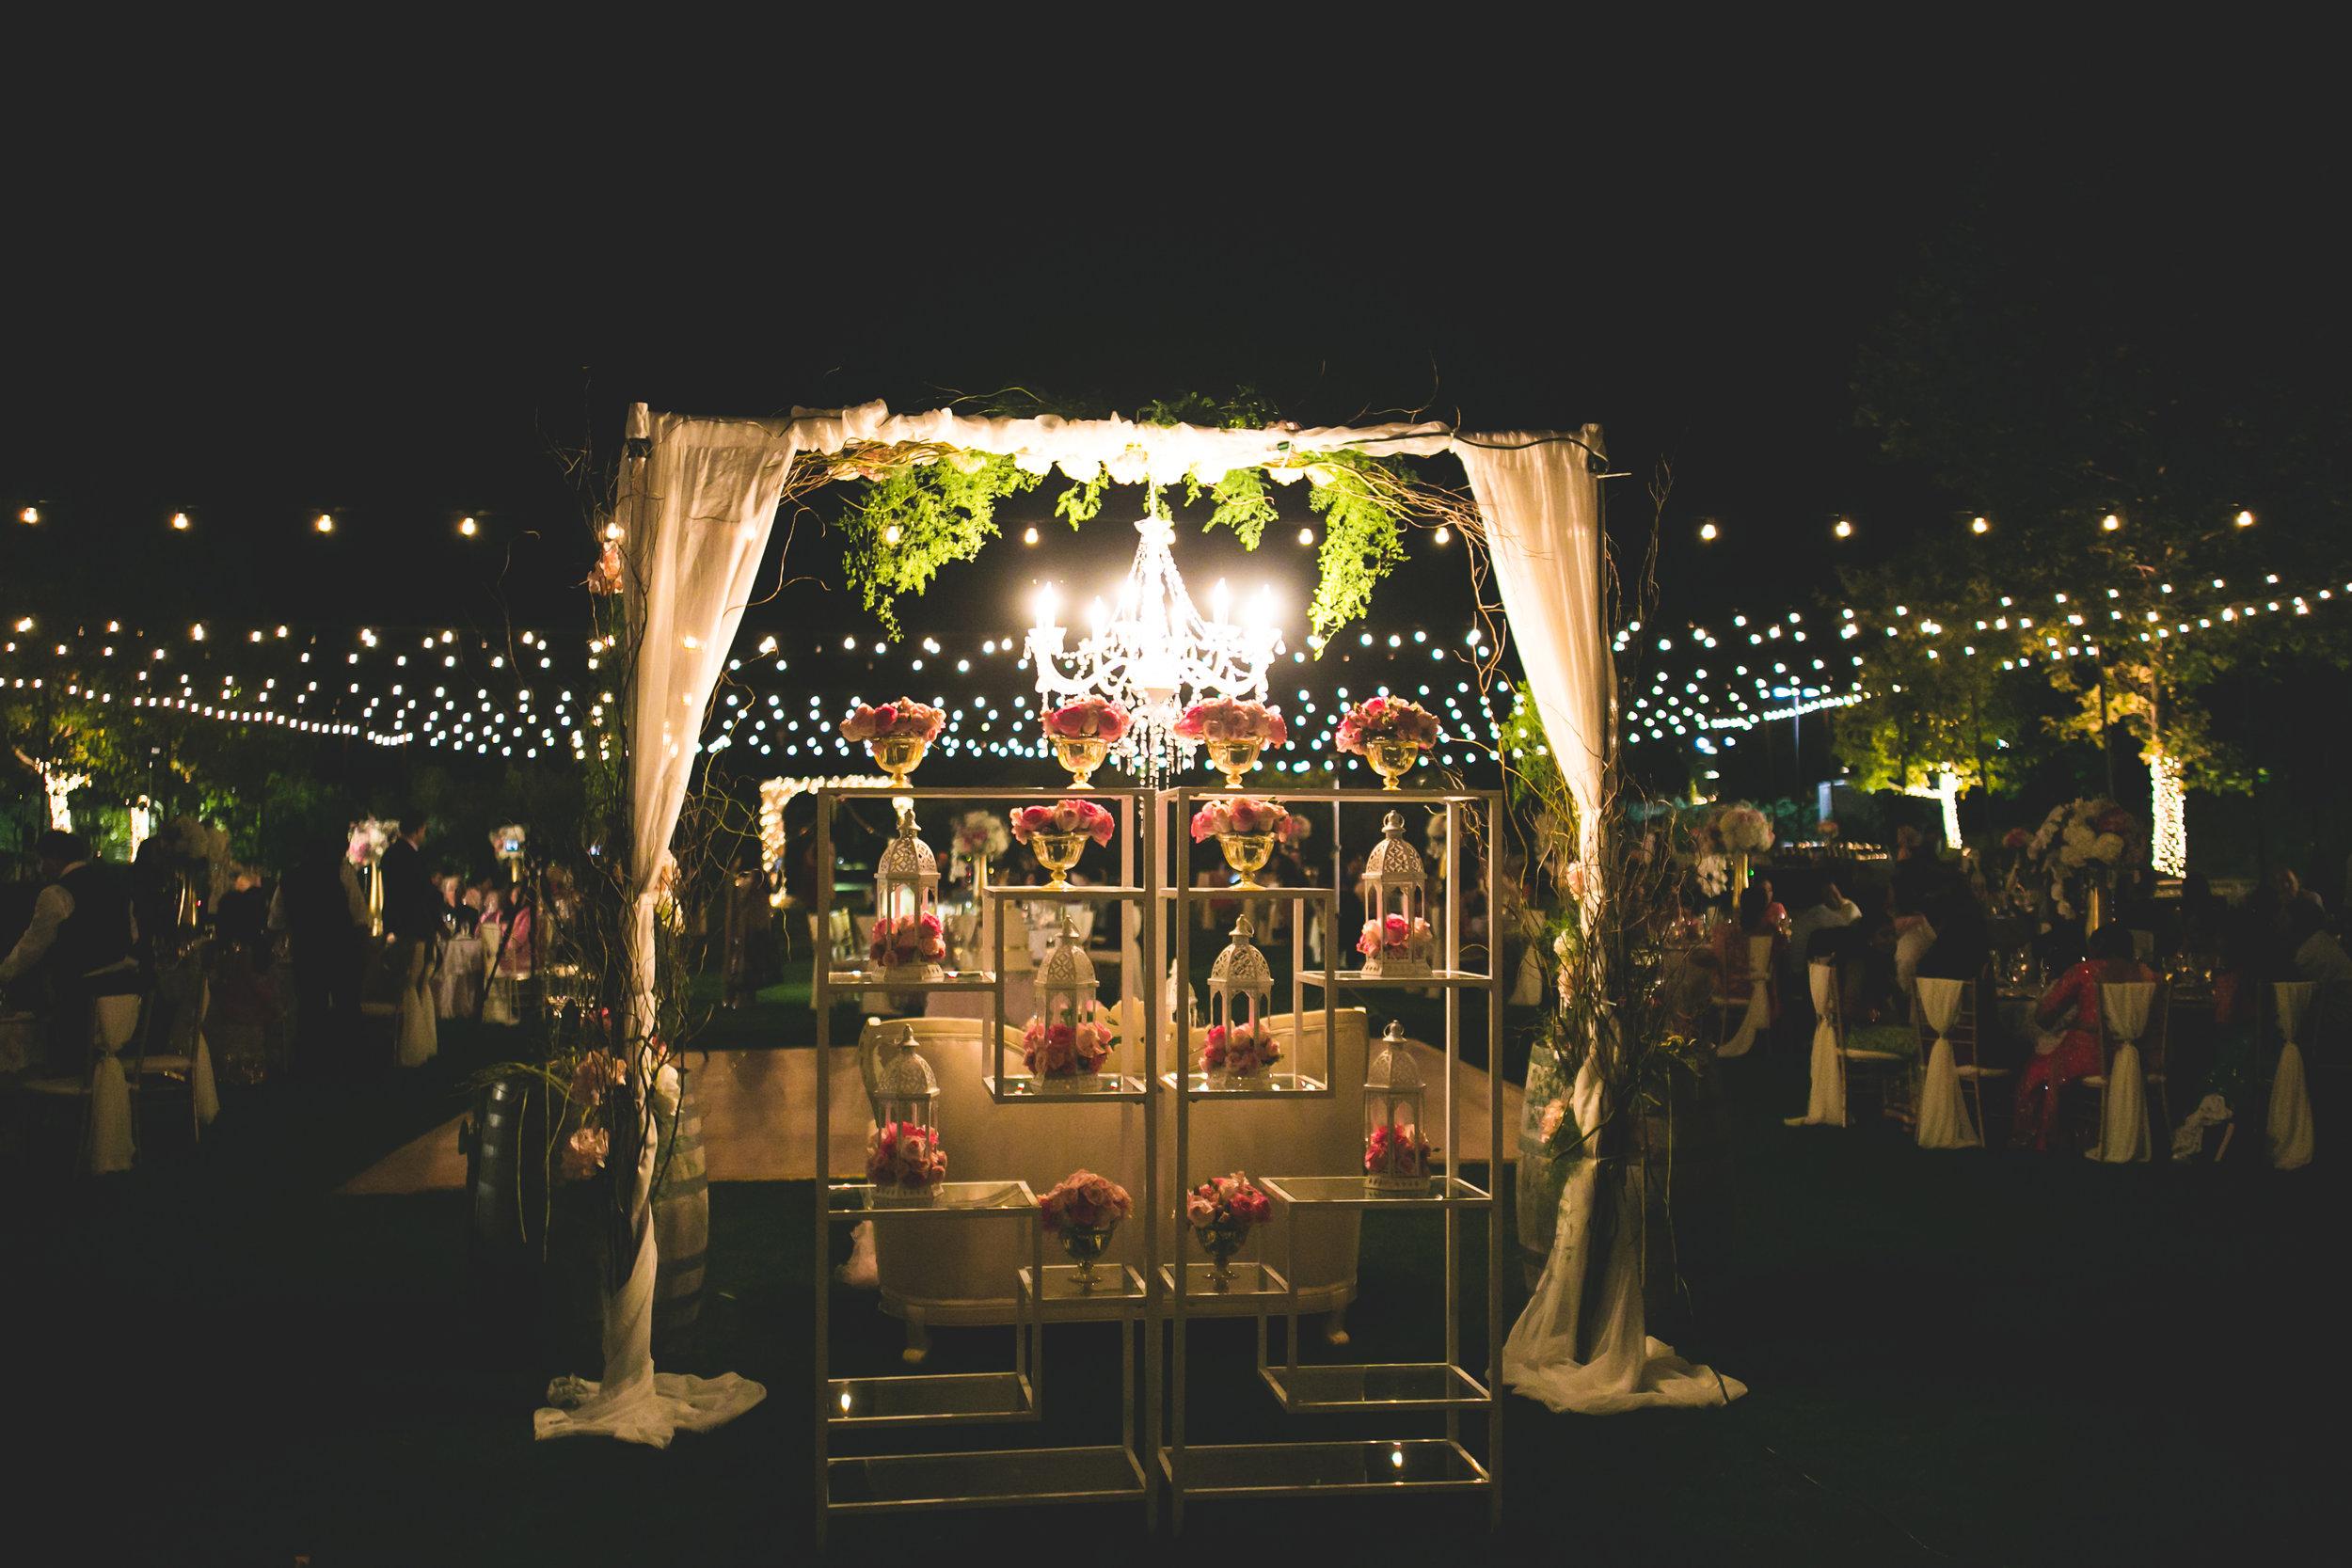 karina_asresh_wedding-0667.jpg